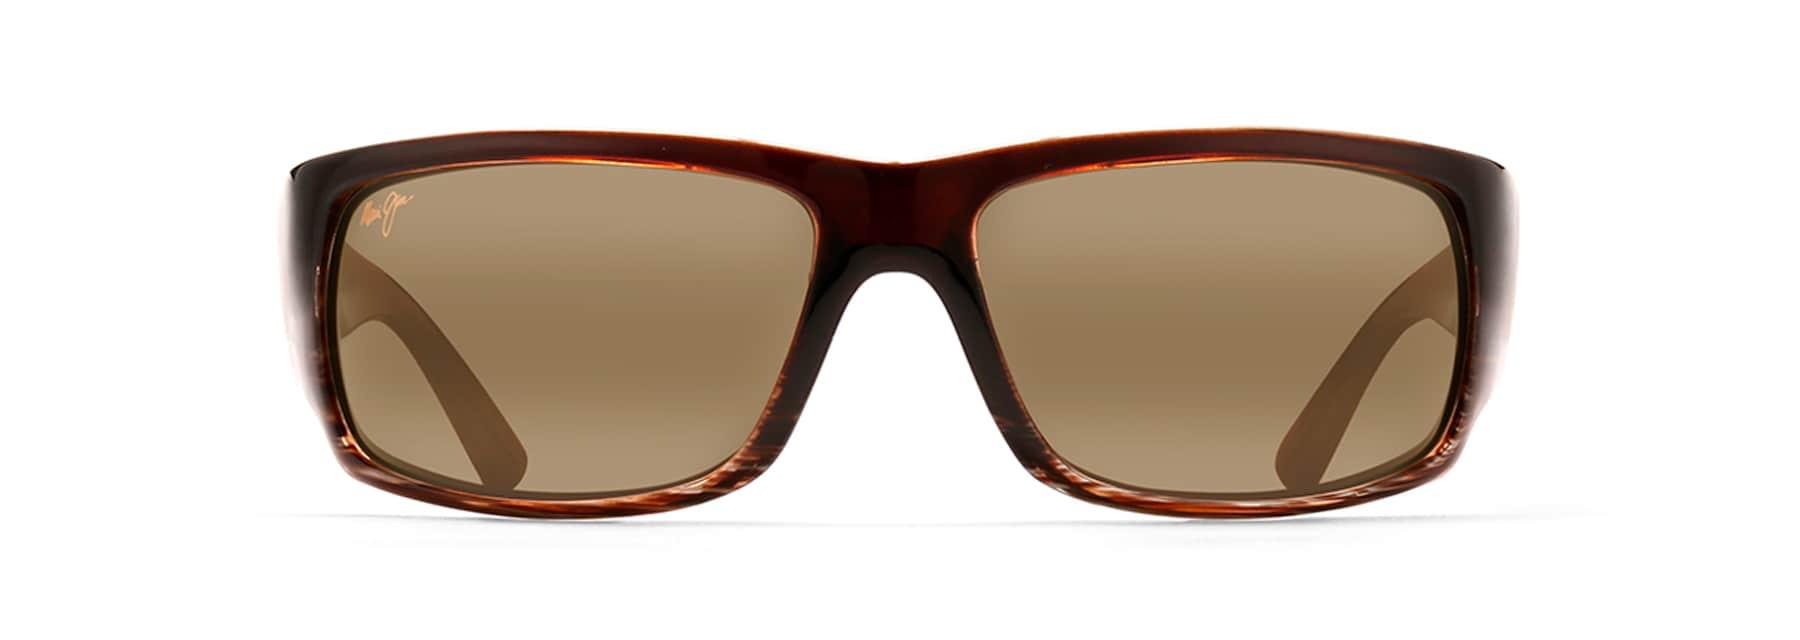 178b999f620 World Cup Polarised Sunglasses